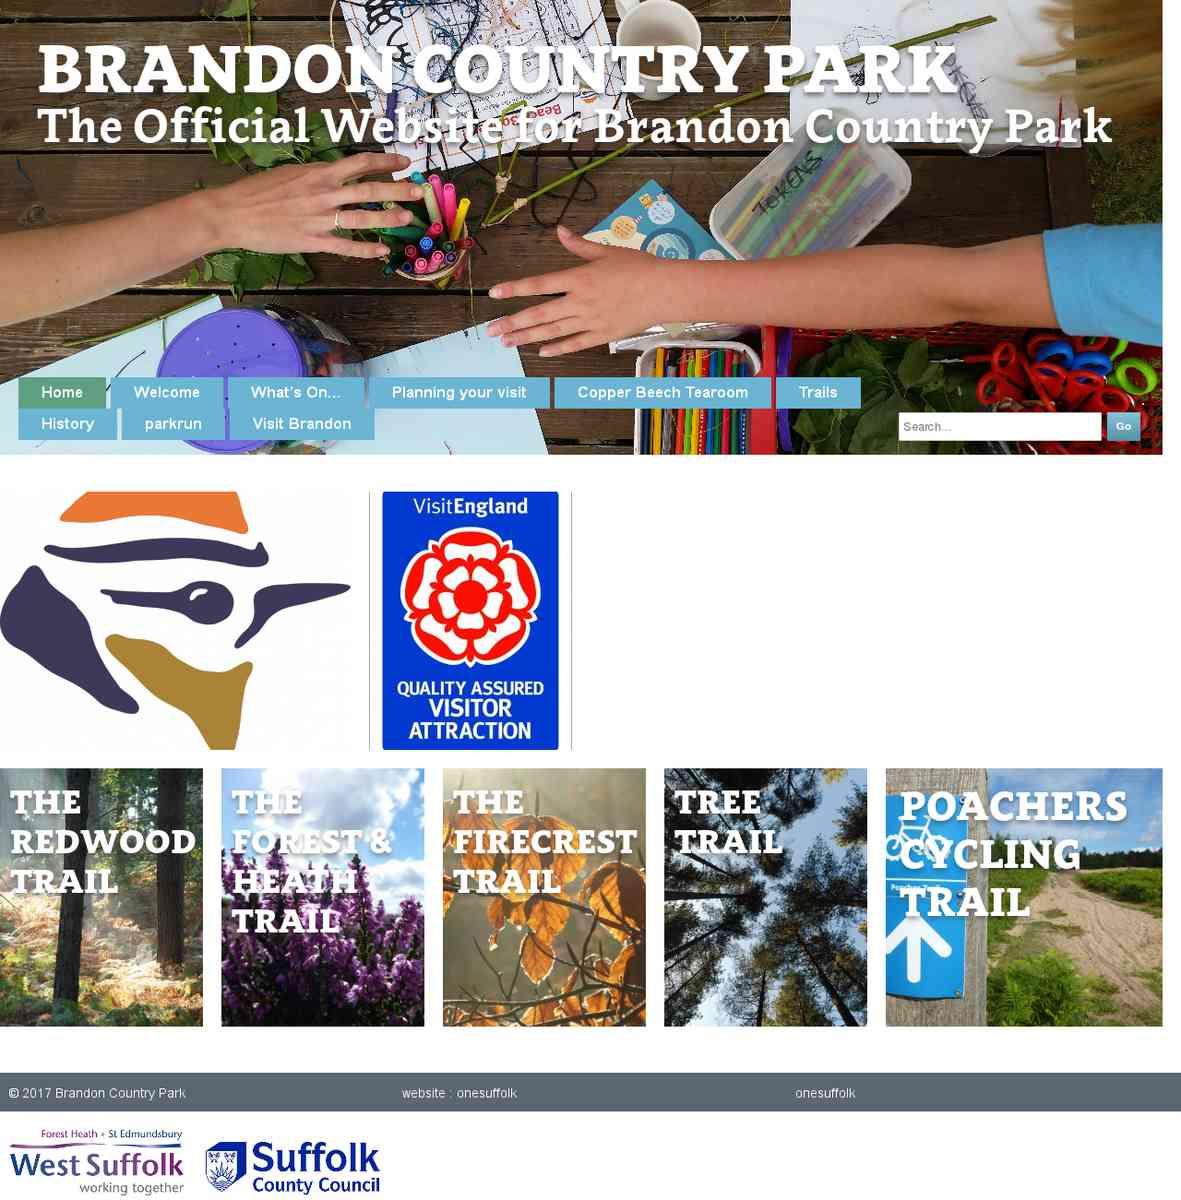 brandoncountrypark.org.uk